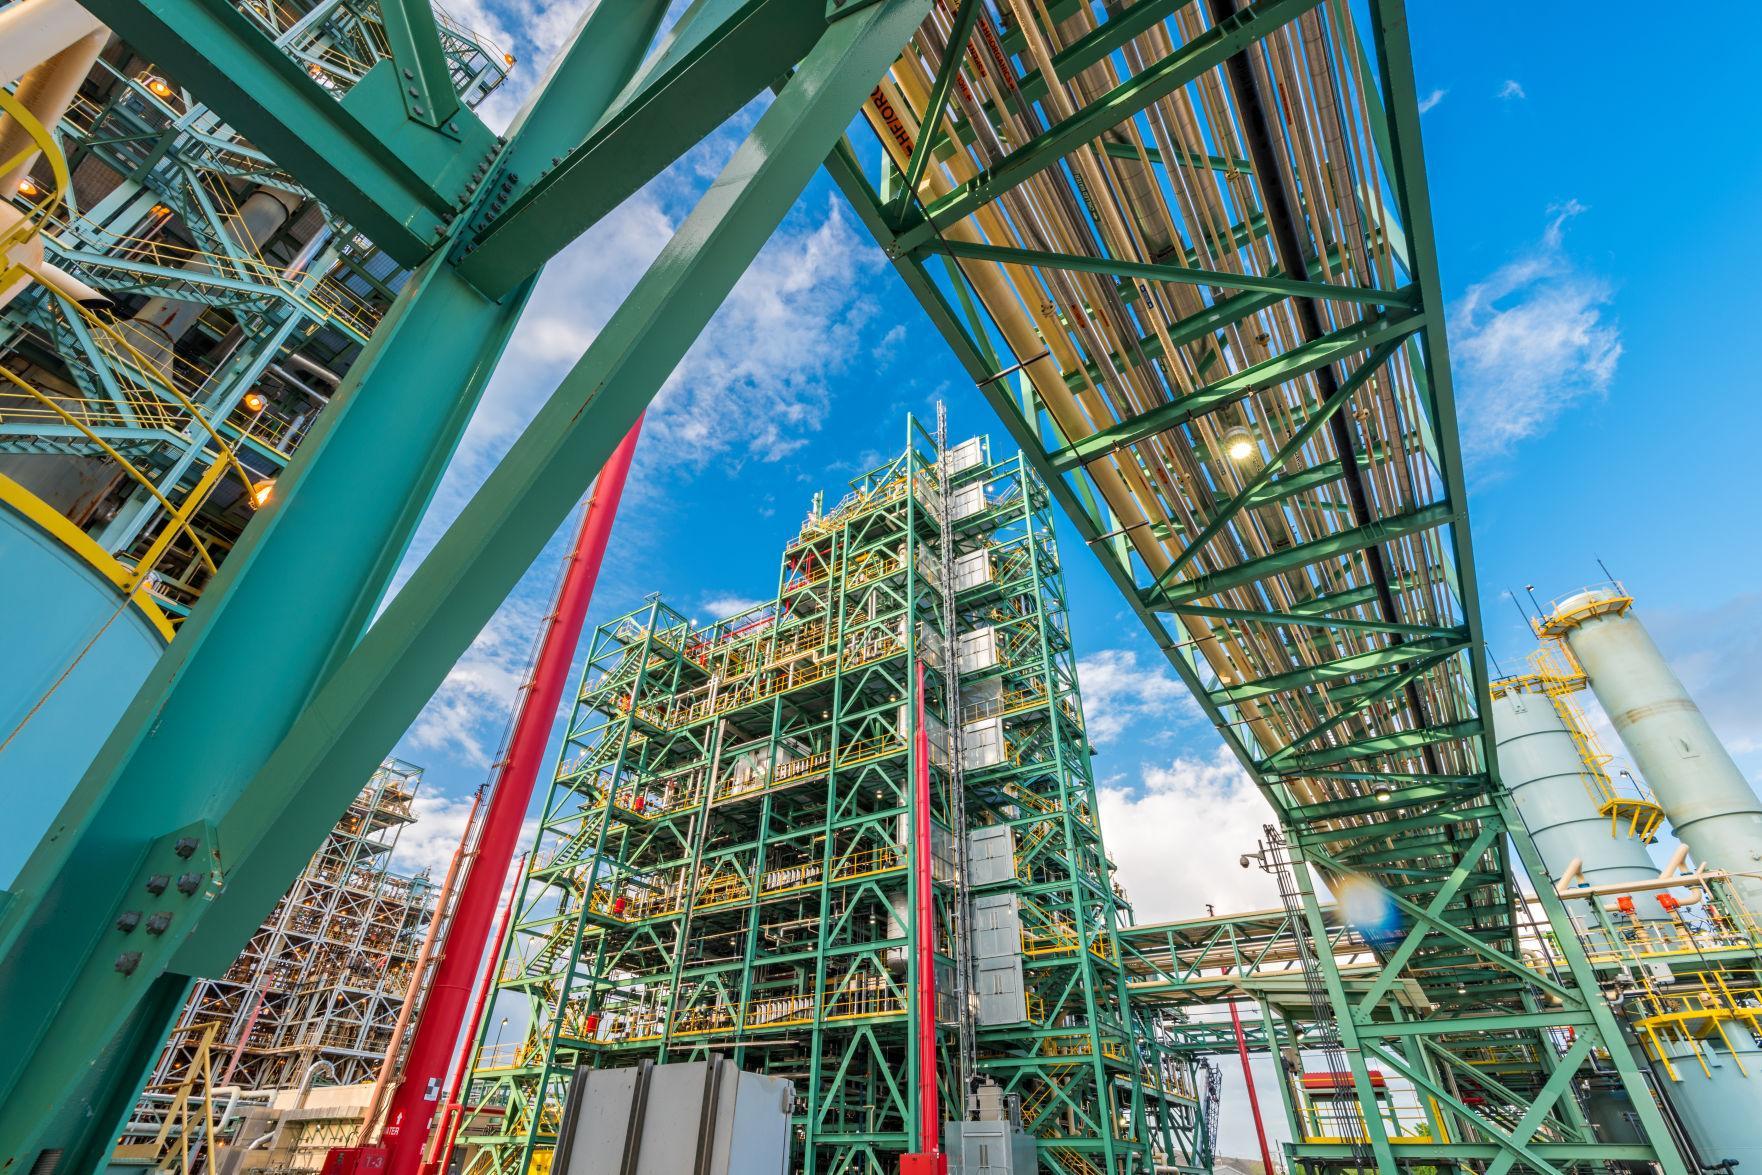 New-Honeywell-plant-to-produce-auto-refrigerant